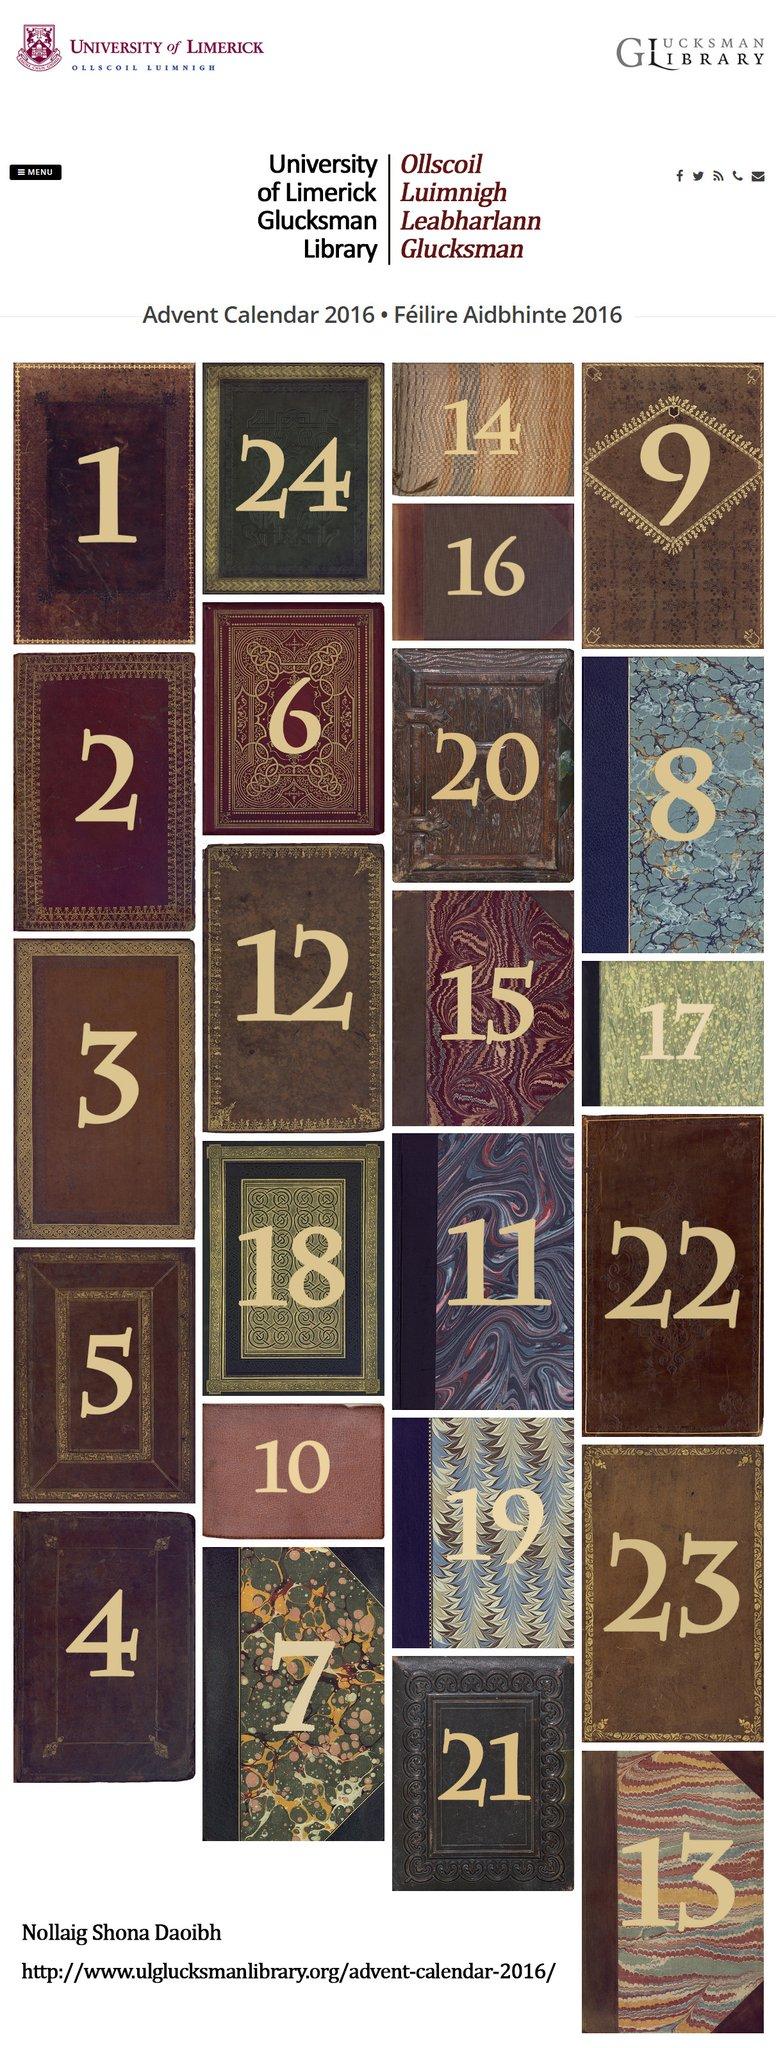 countdown to christmas with the glucksman librarys 2016 advent calendar conul